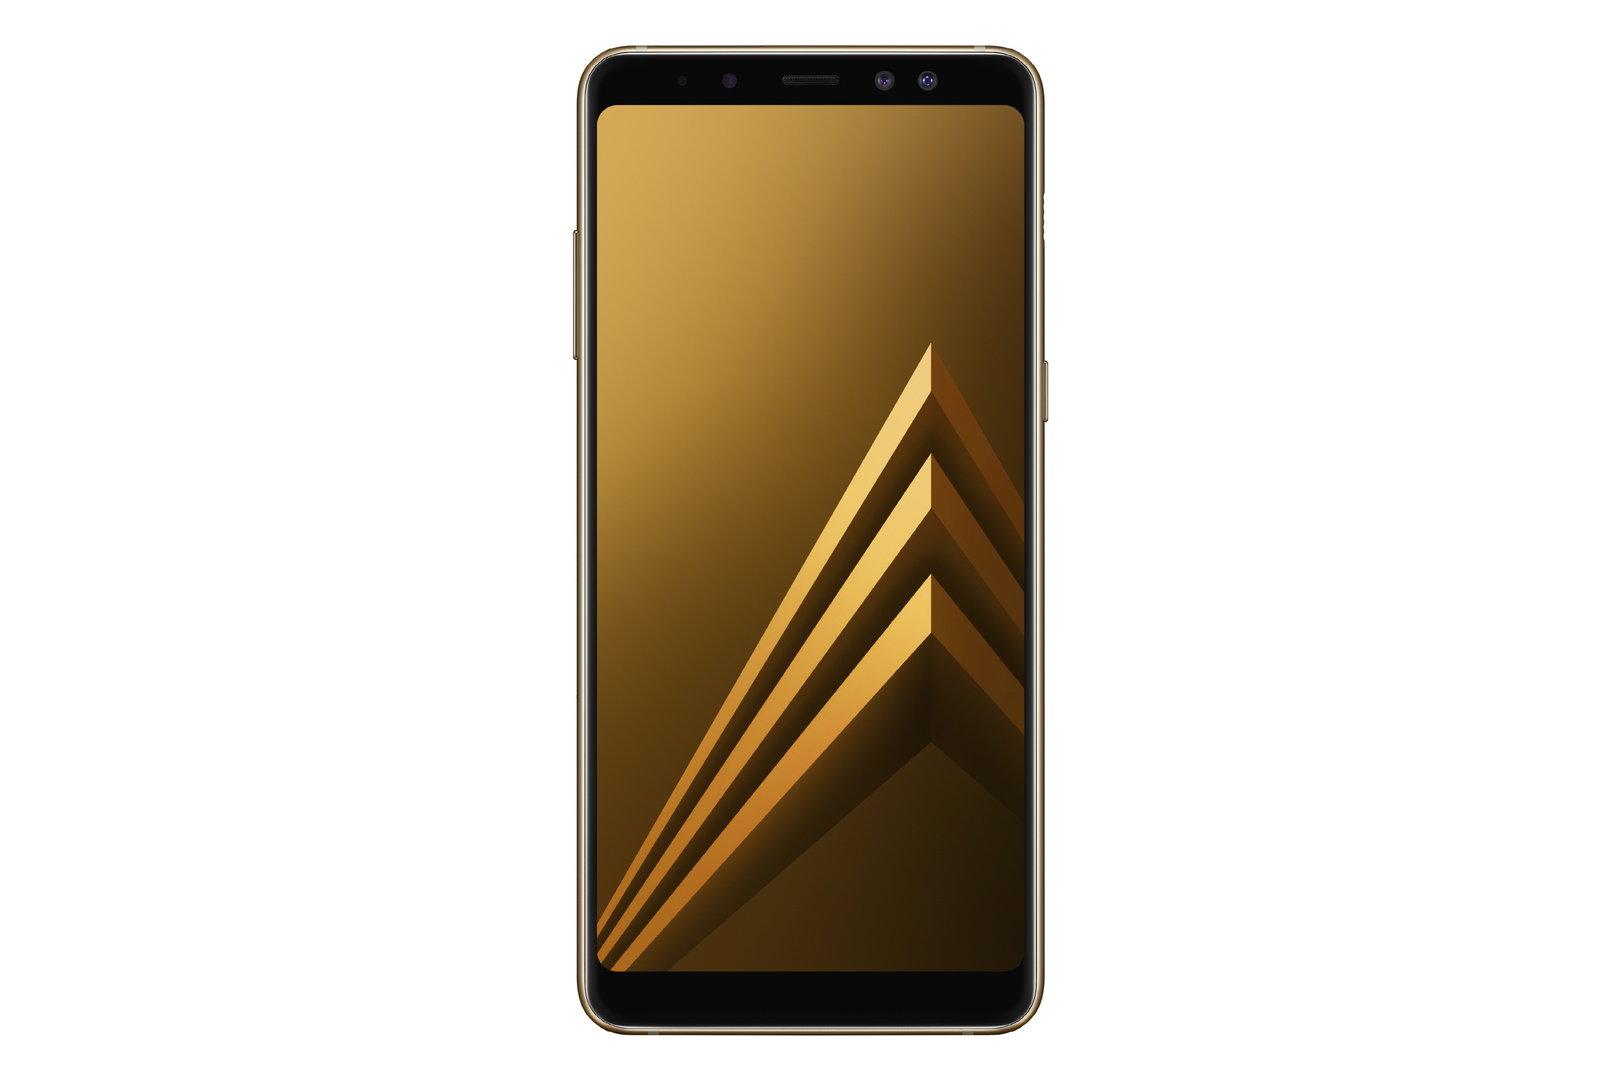 Galaxy A8 in Gold